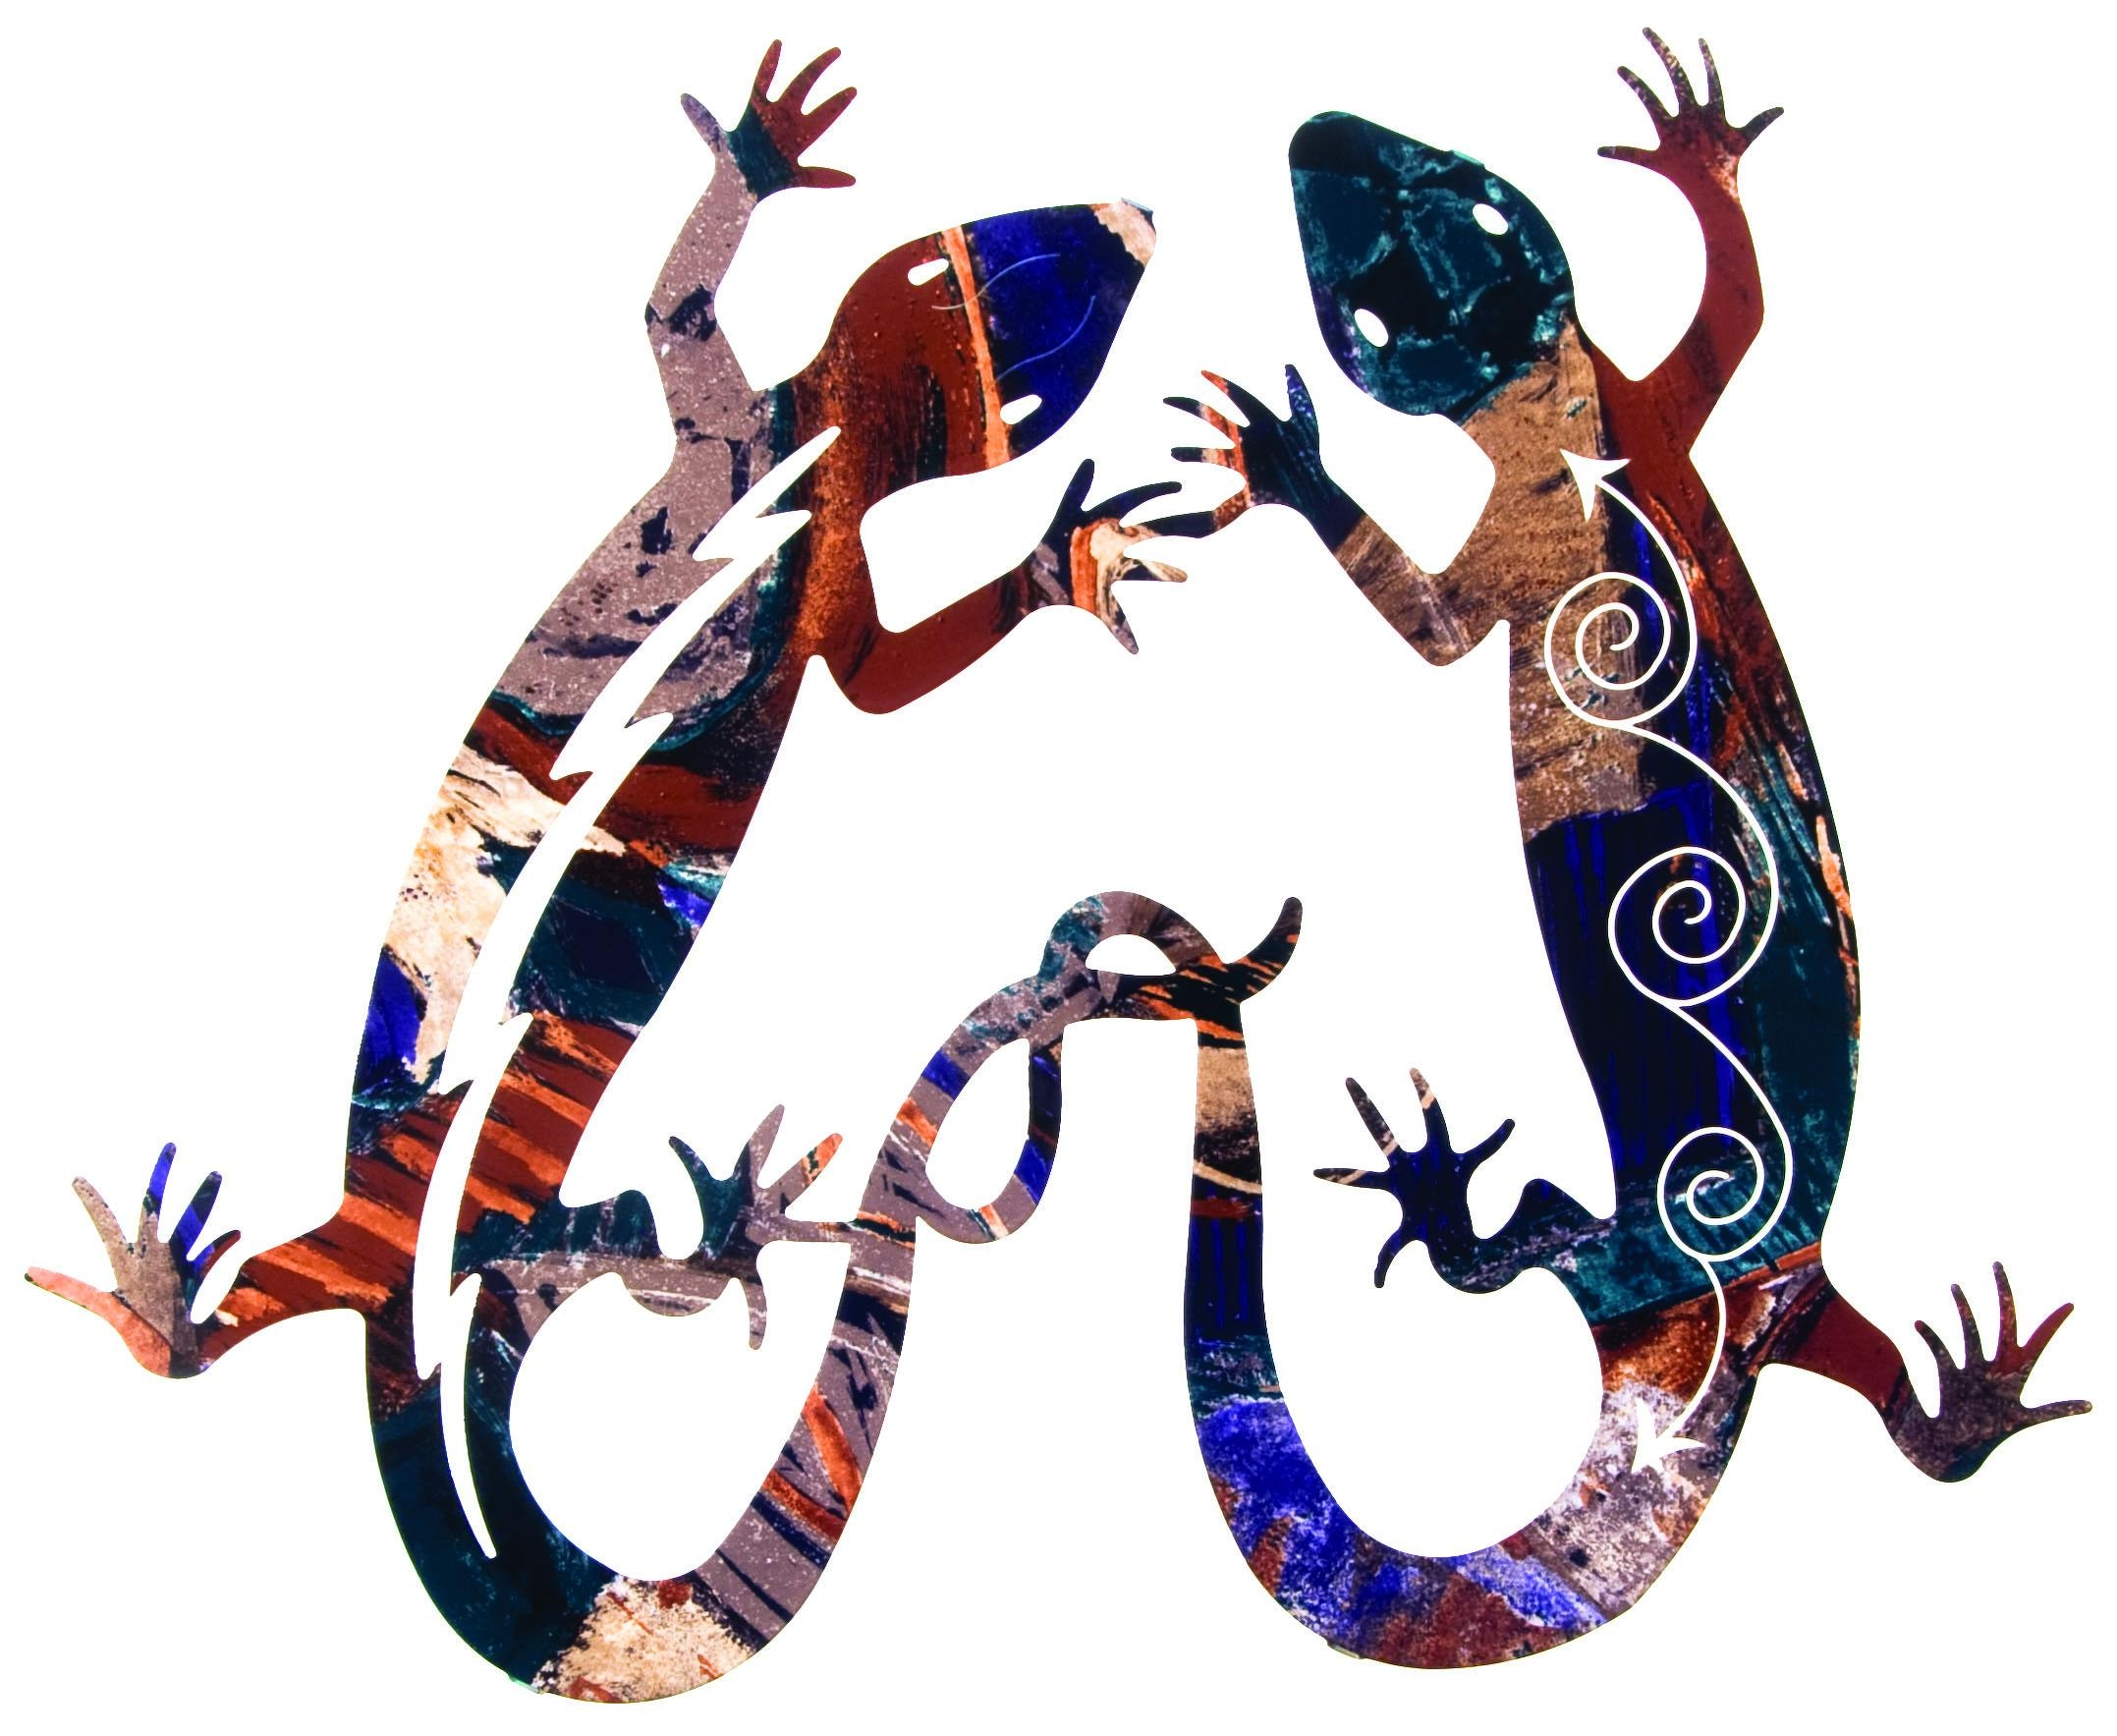 Lizard Tangolazart – Sanger Metal Art And Gifts Intended For Lazart Metal Art (View 7 of 20)